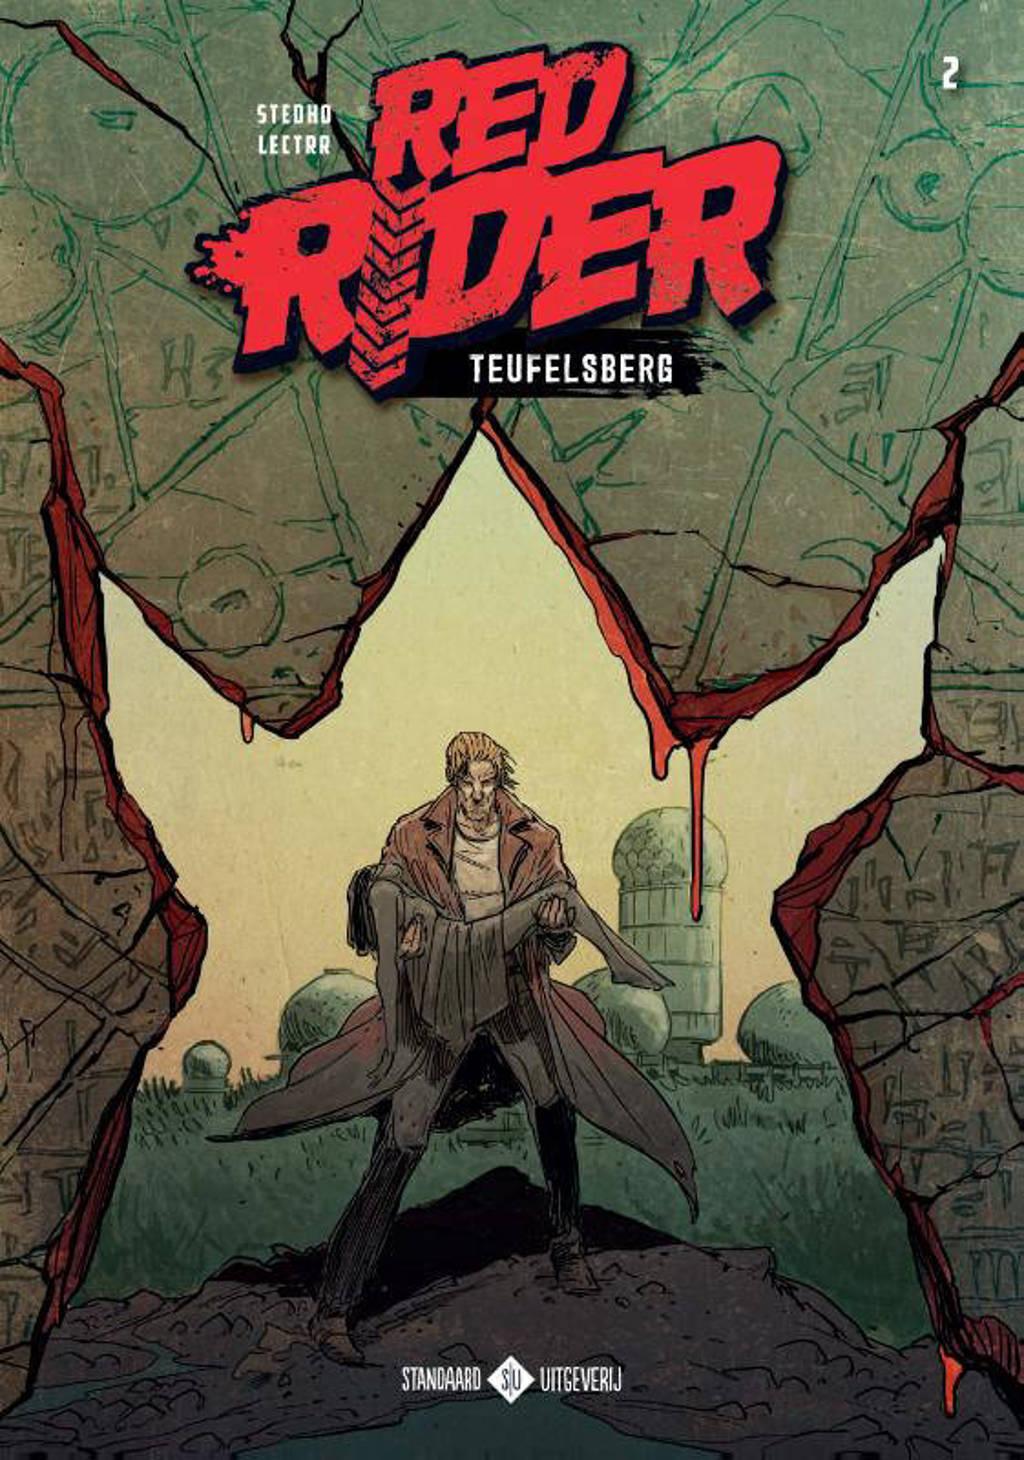 Red Rider: Teufelsberg - Stedho en Lectrr